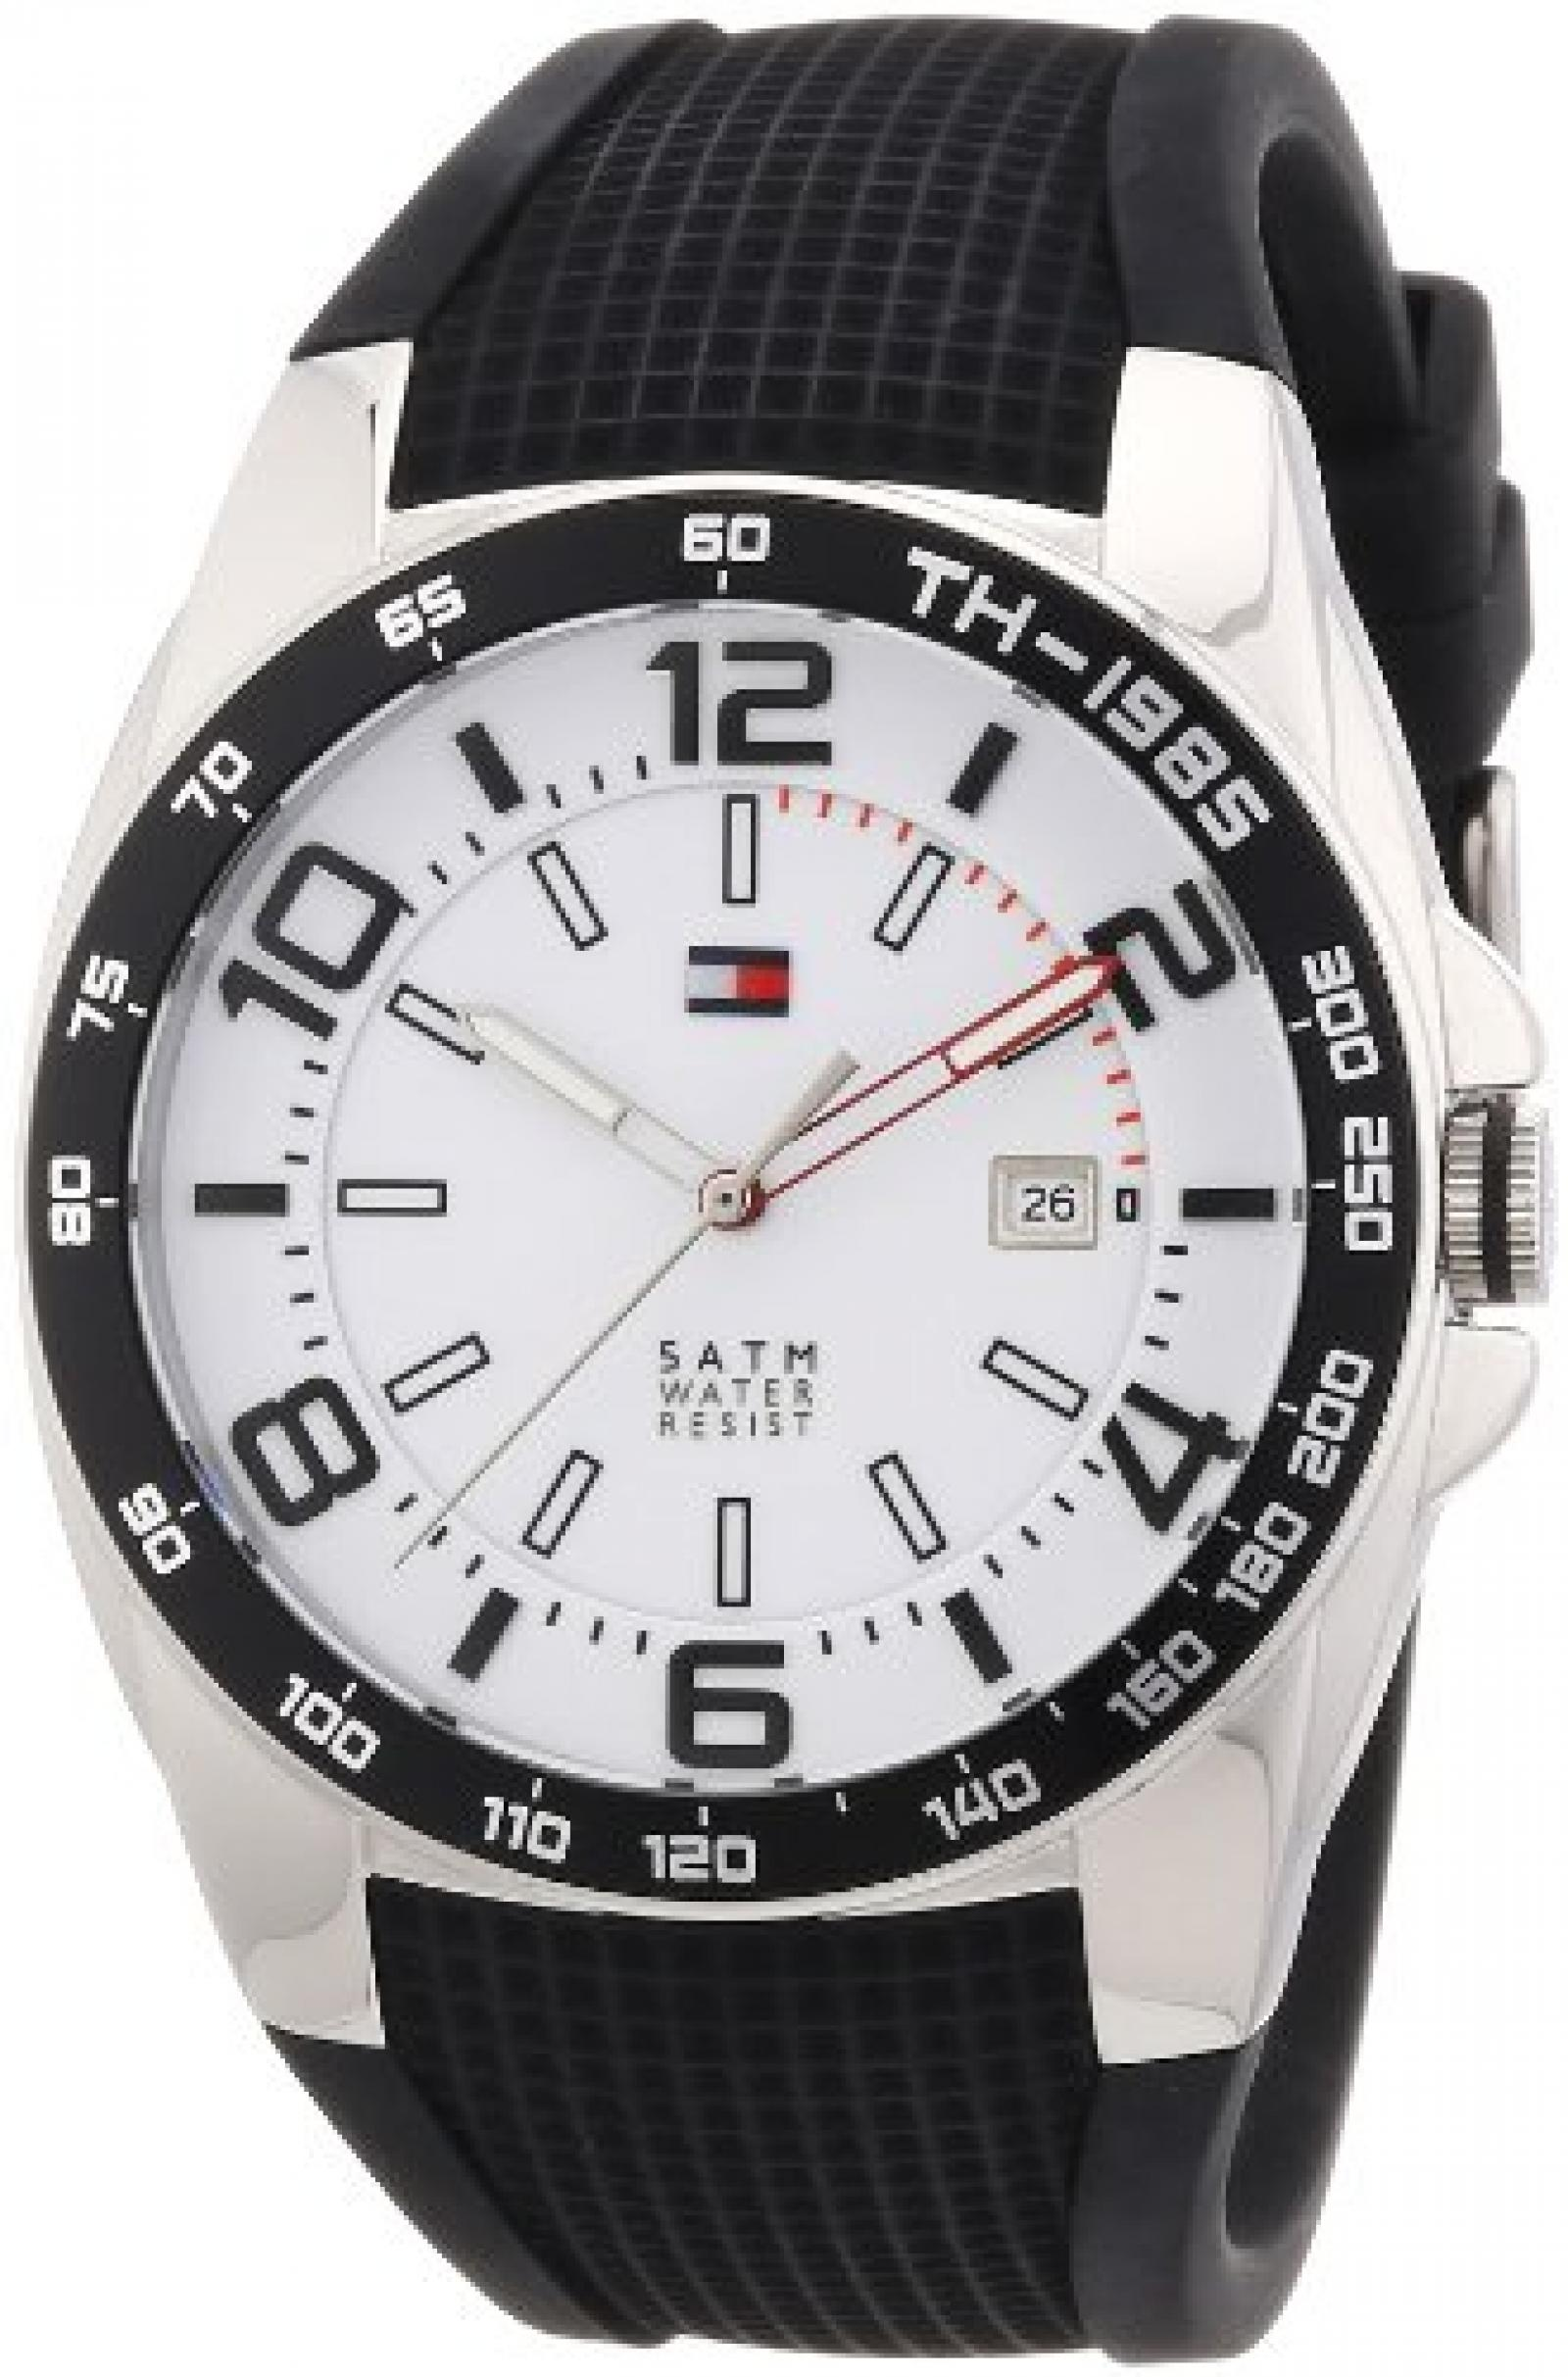 Tommy Hilfiger Watches Herren-Armbanduhr XL Analog Quarz Silikon 1790884